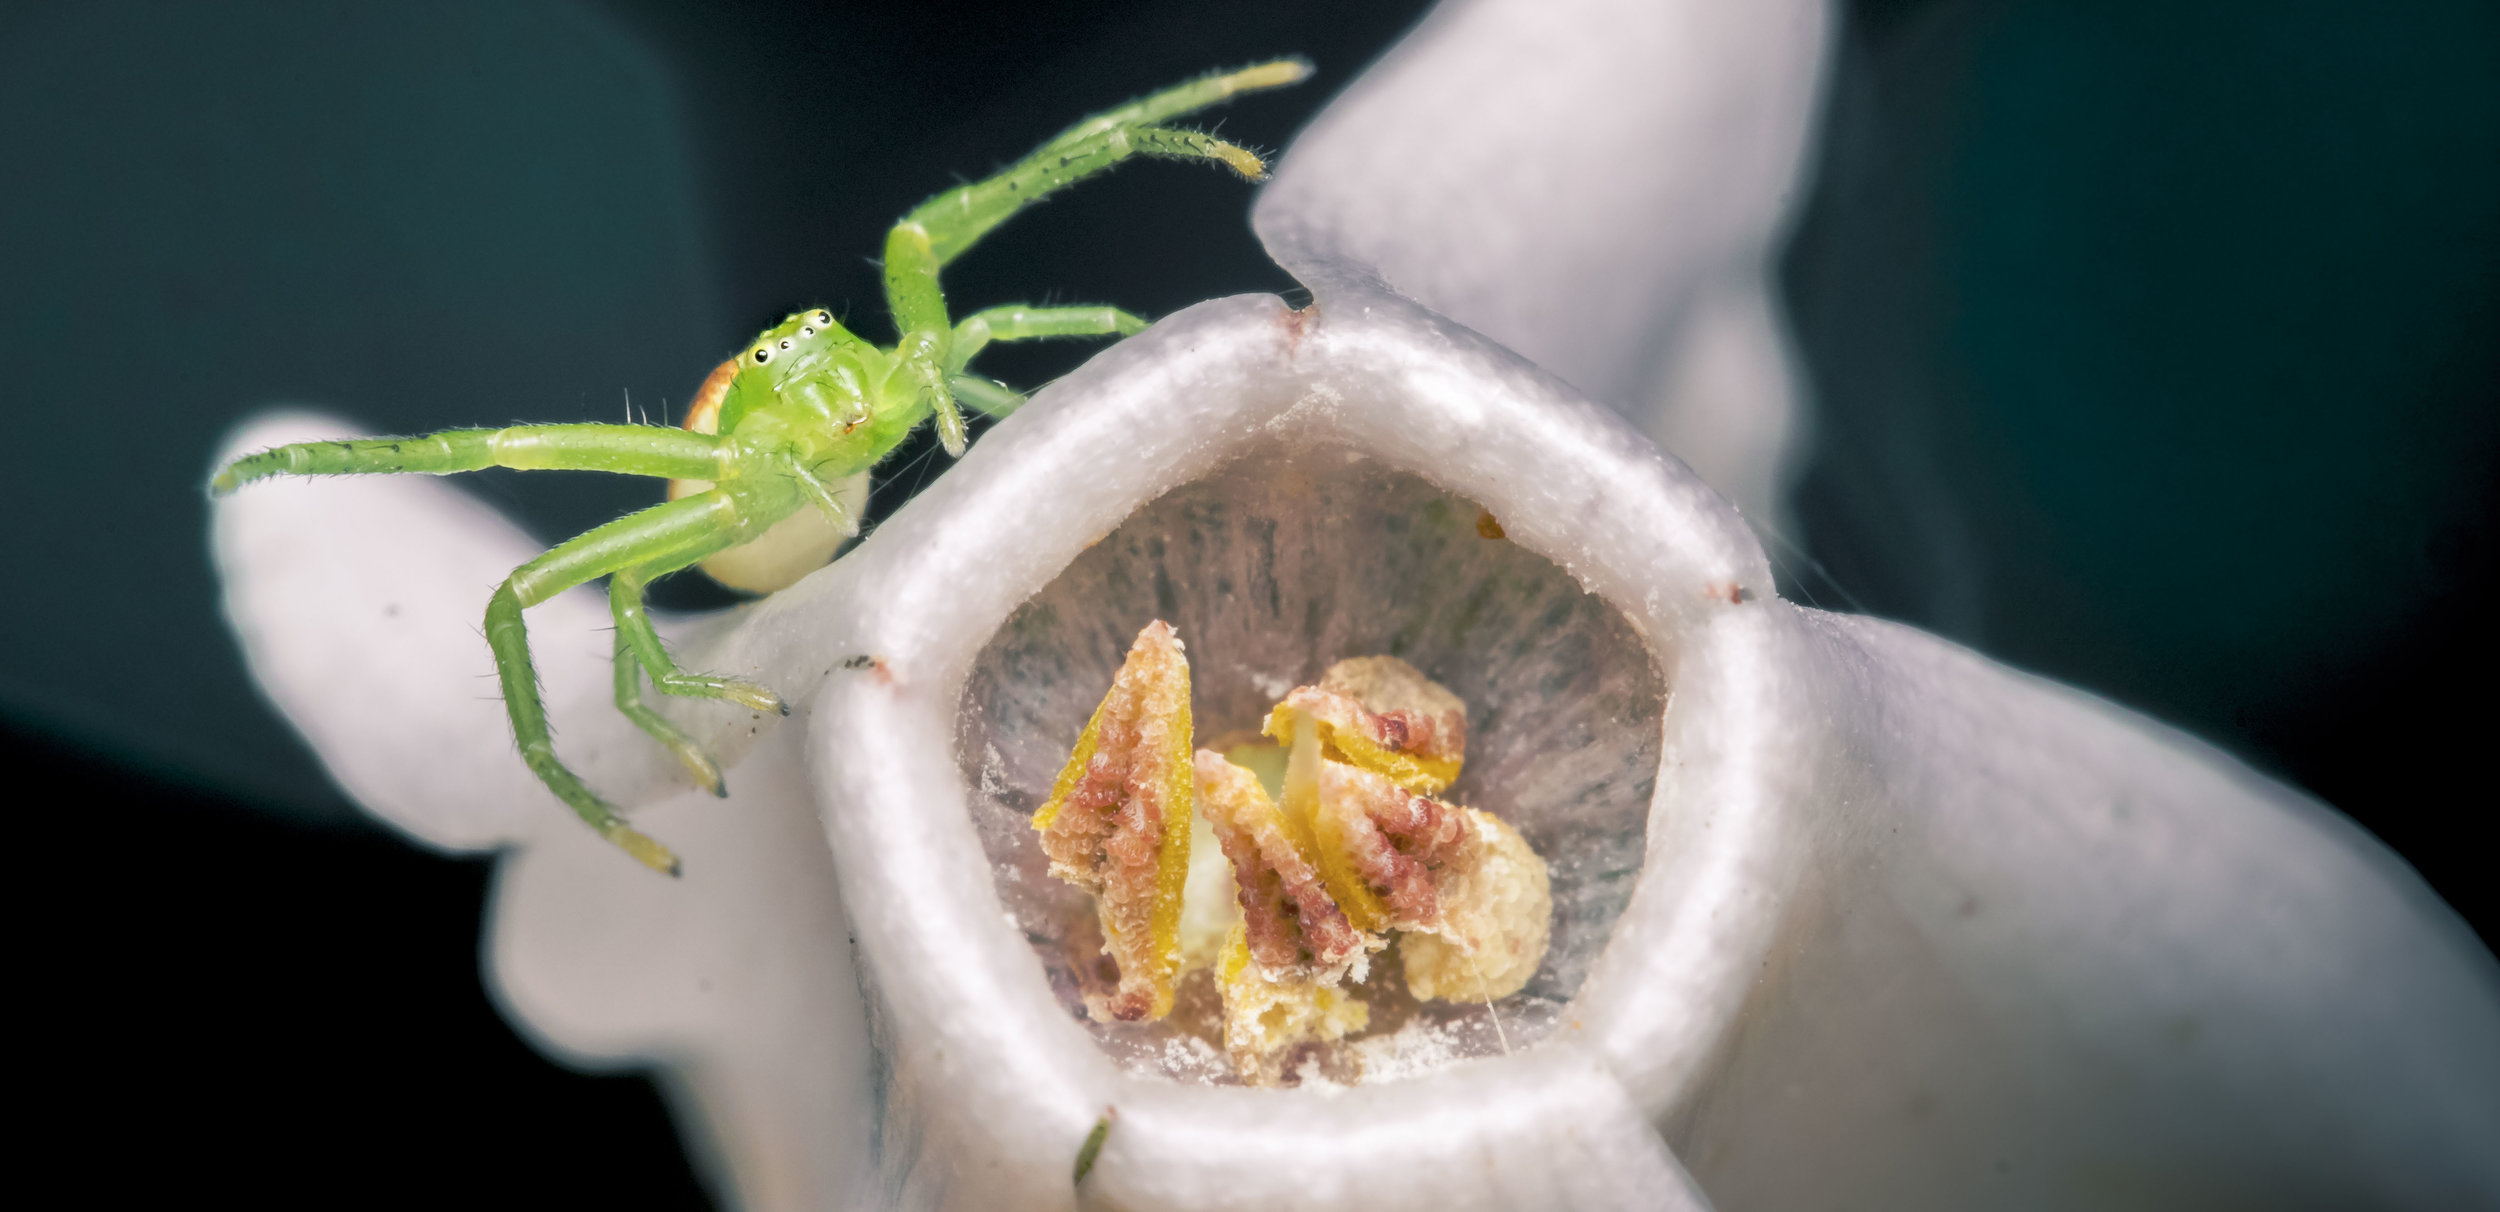 GREEN CRAB SPIDER Diaea dorsata1.jpg